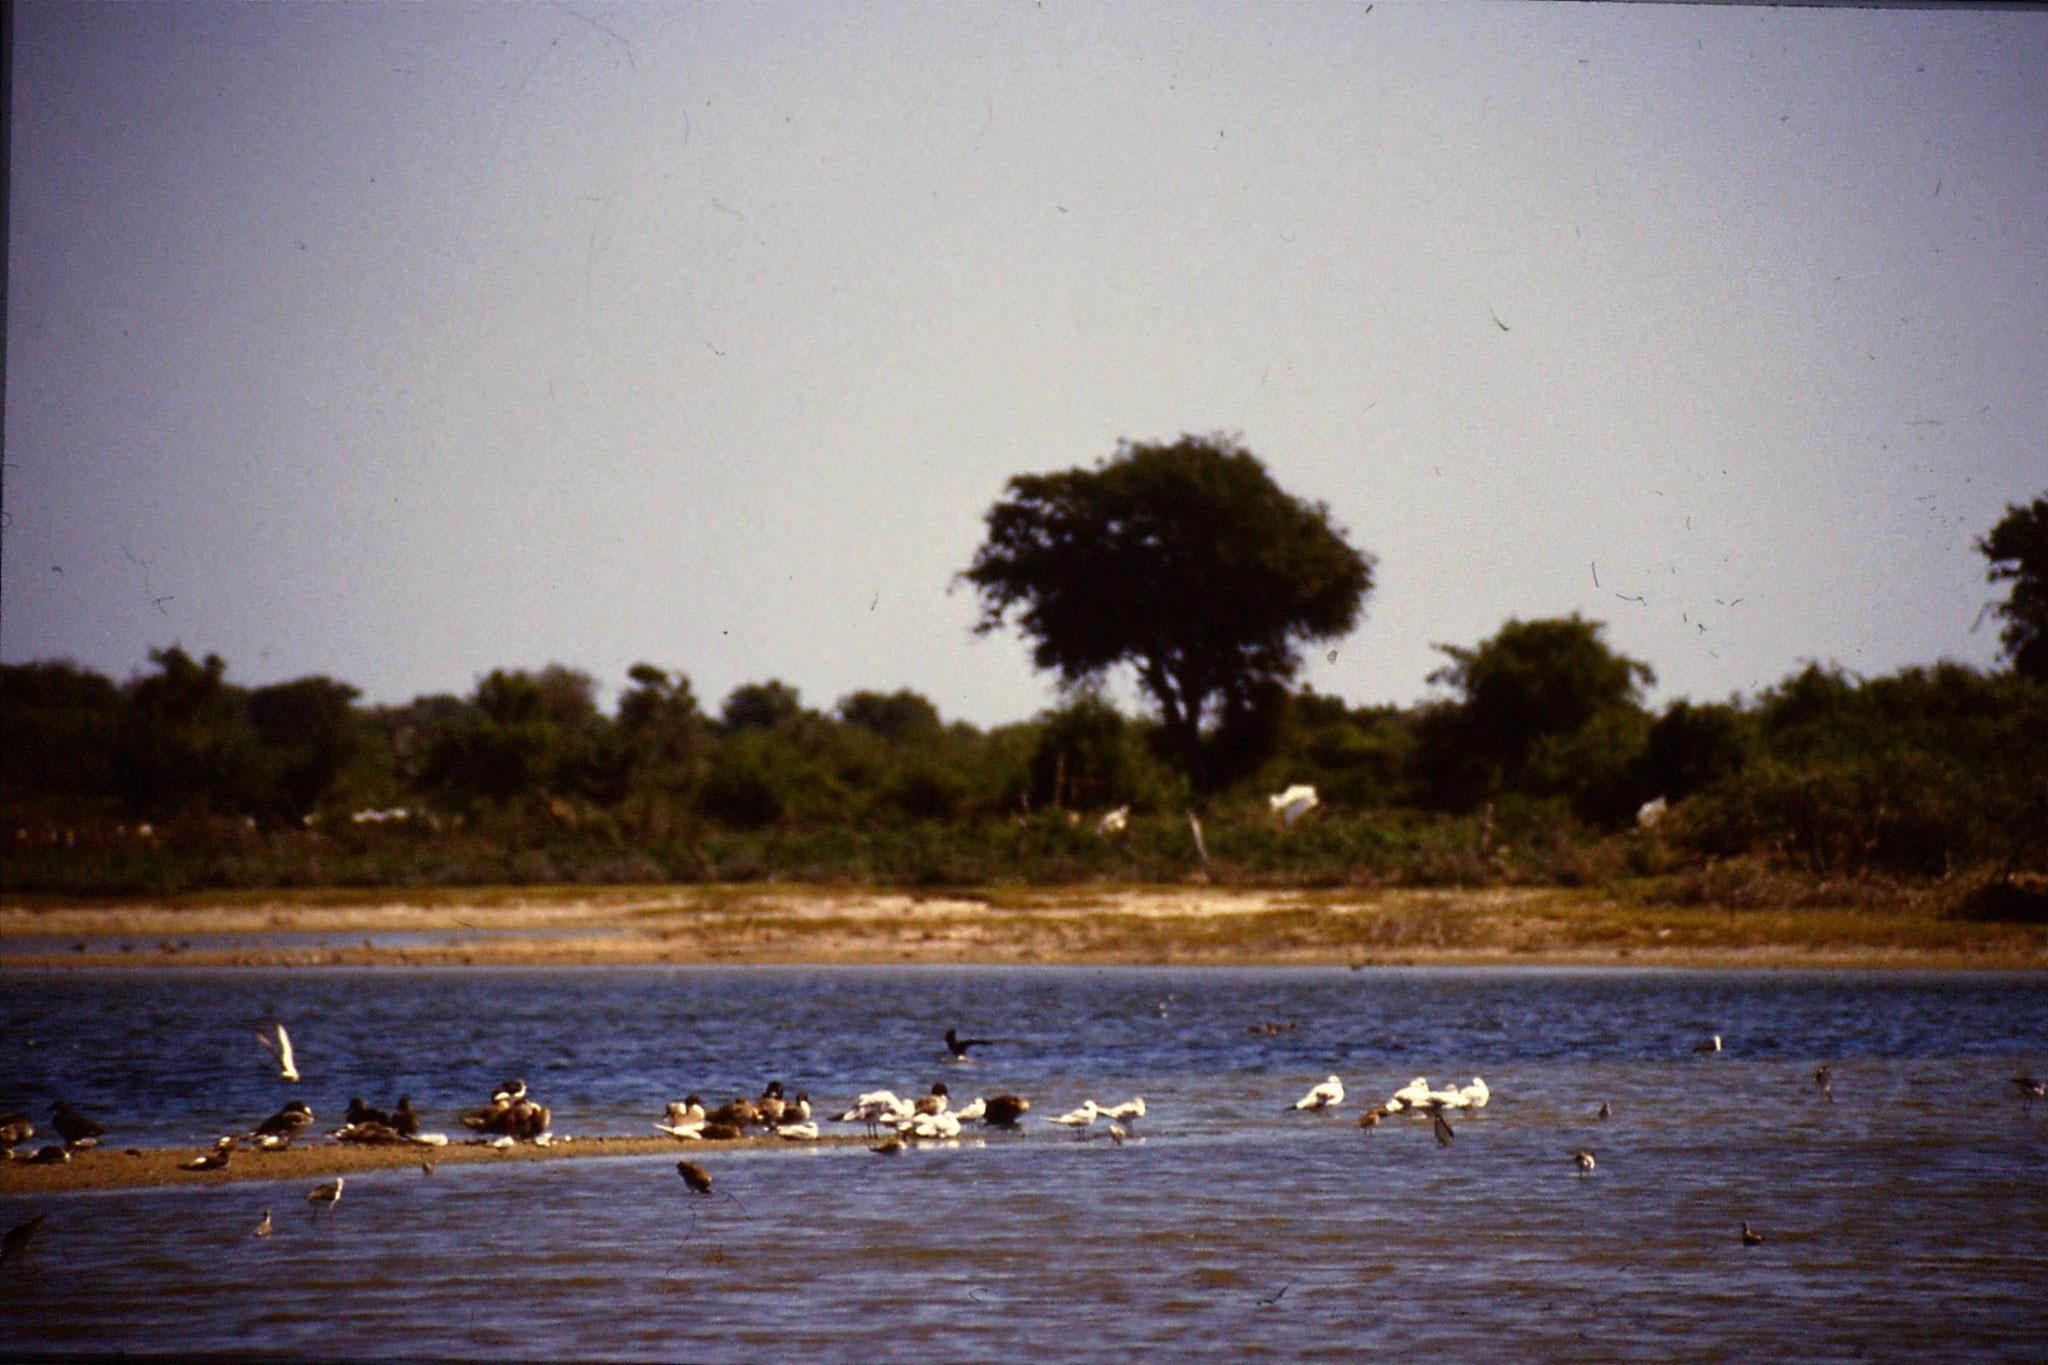 26/1/1990: 36: Kirinda lagoon